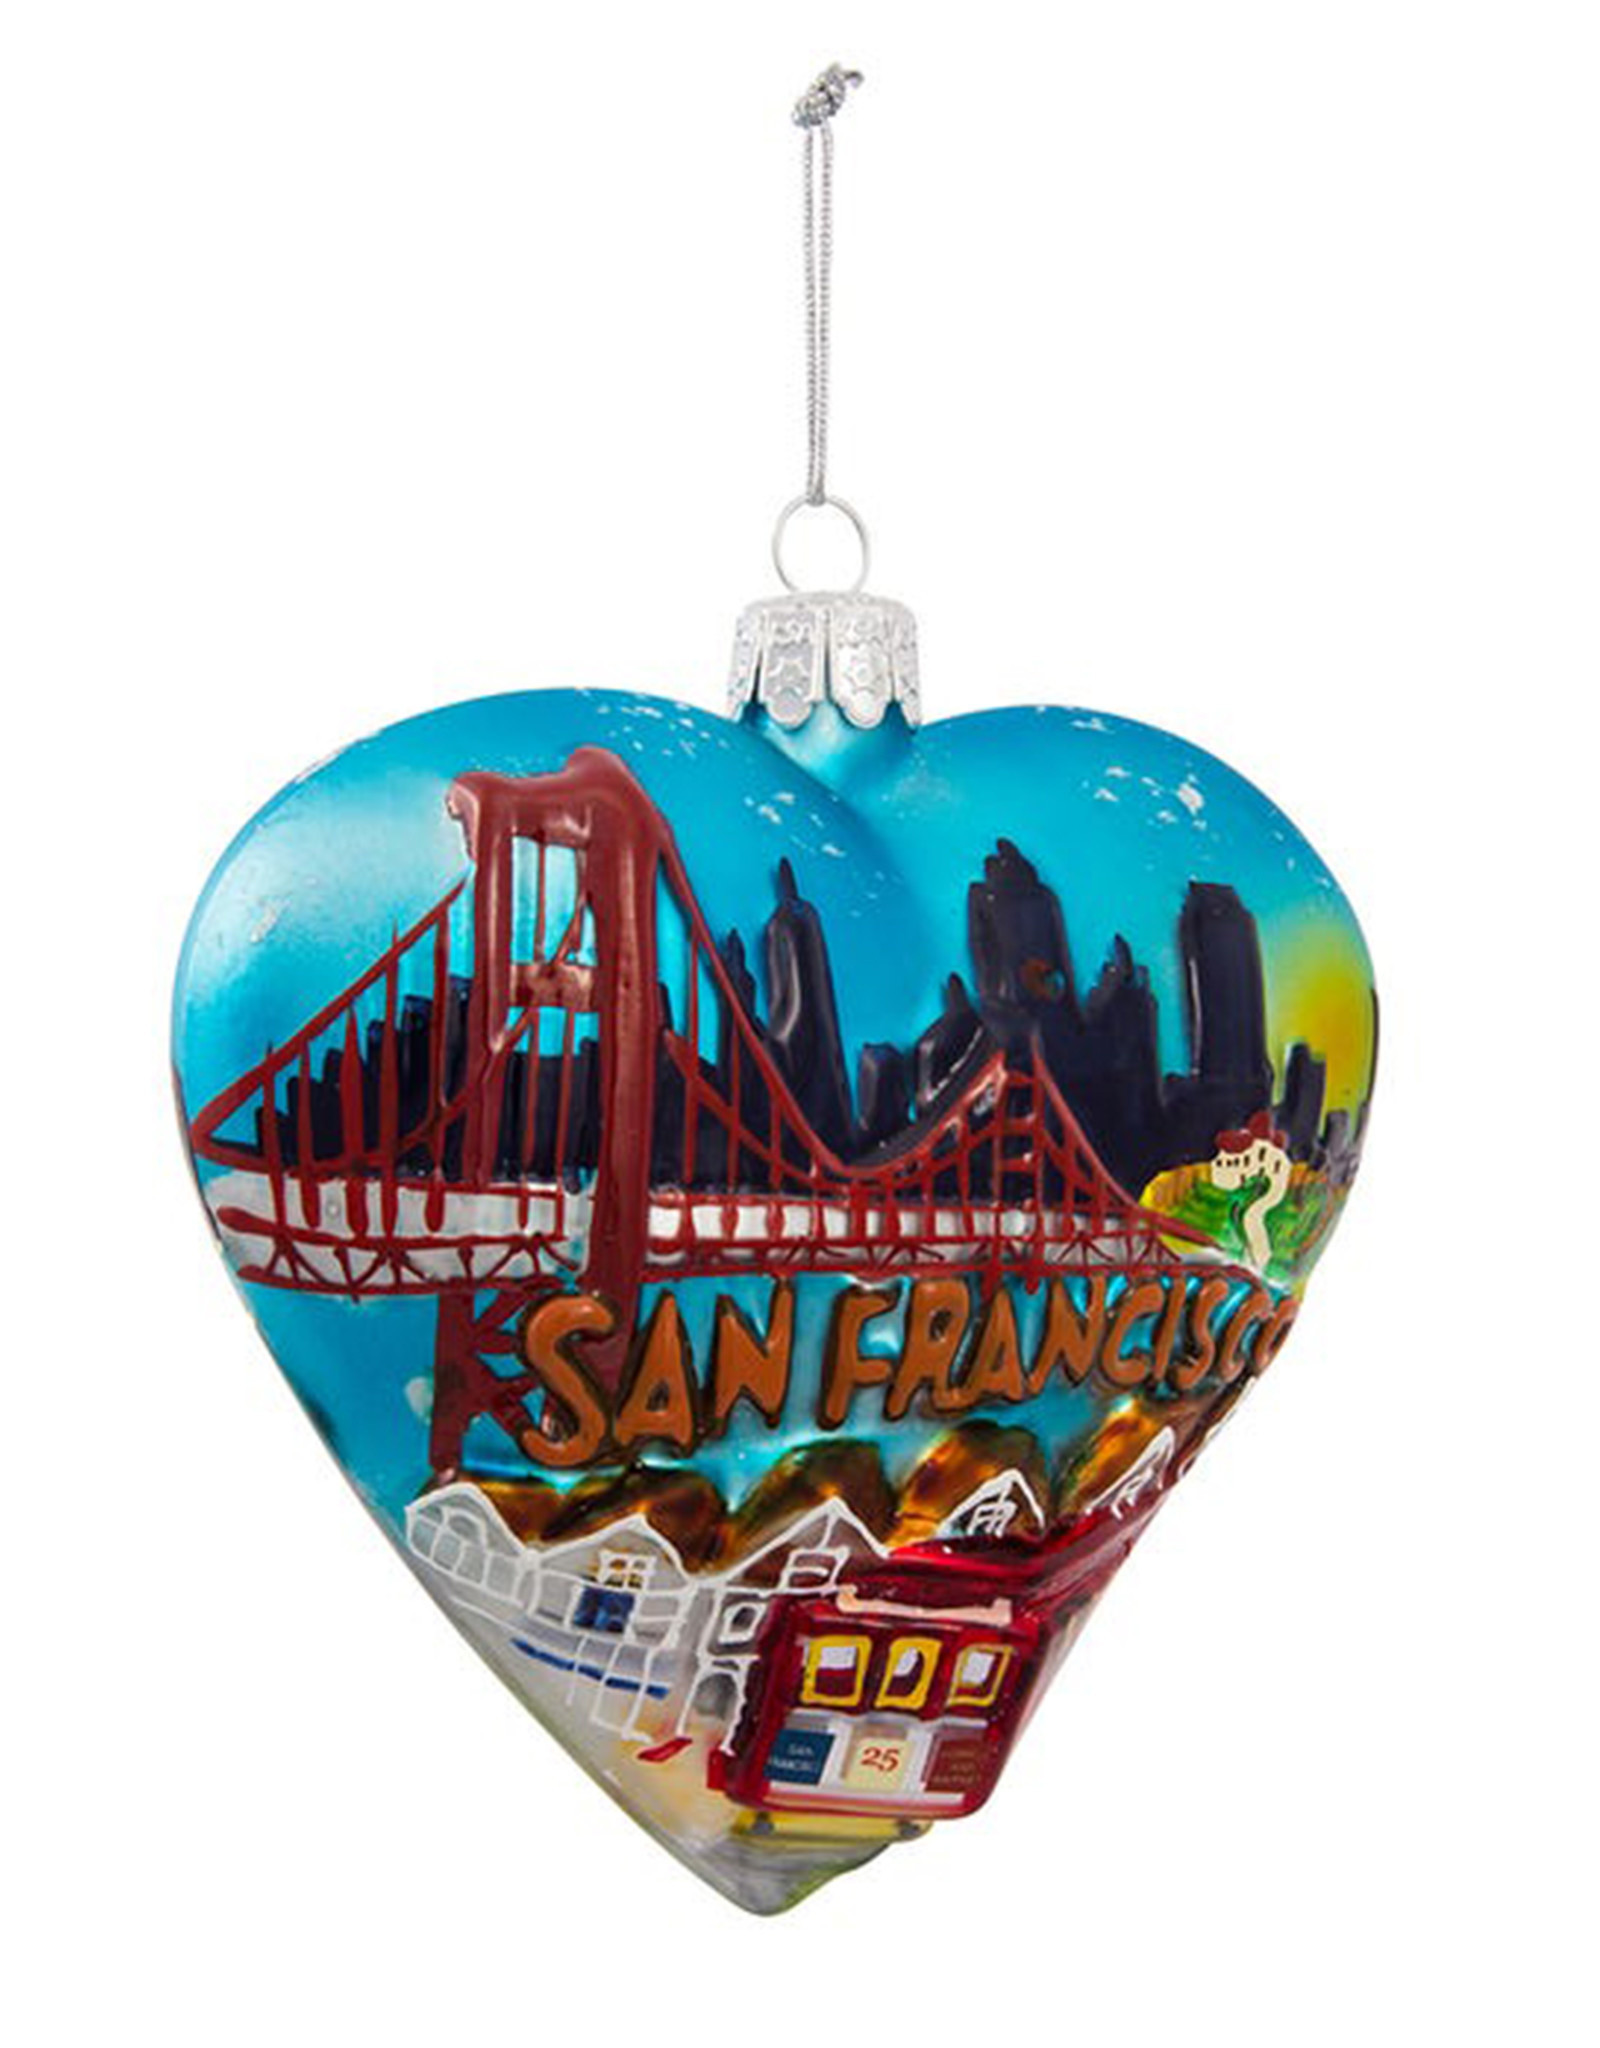 KURT ADLER SAN FRANCISO HEART ORNAMENT